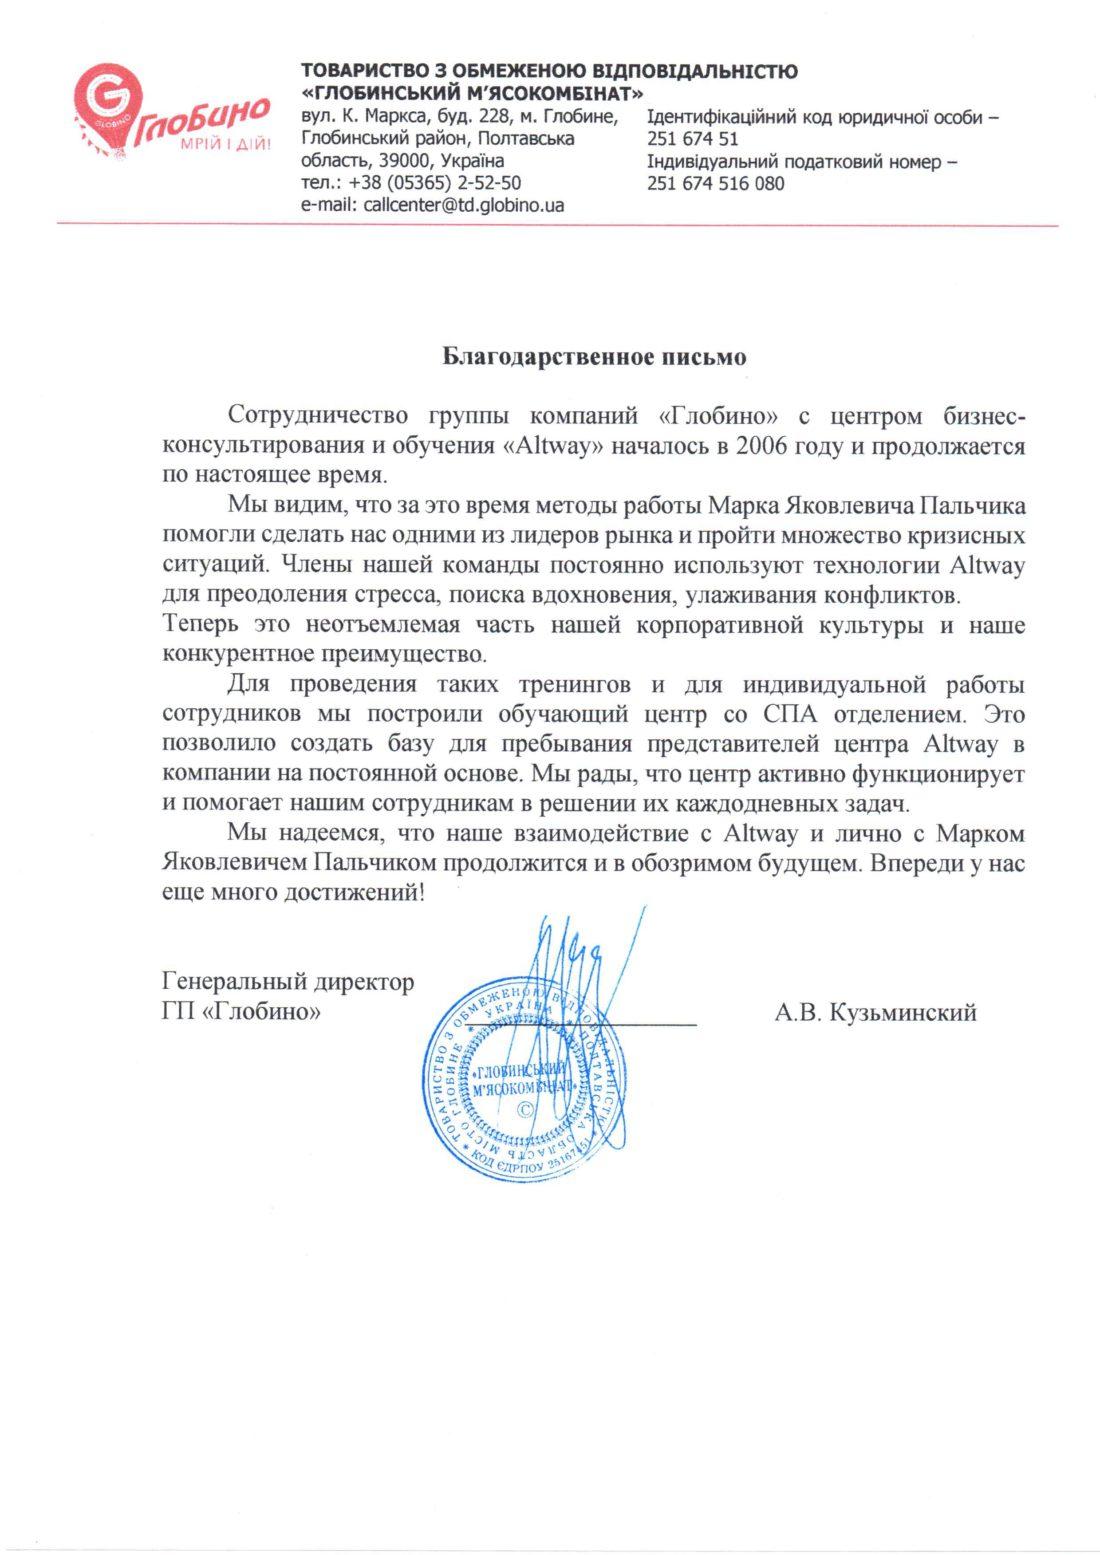 Blagodarstvennoe pismo 1100x1555 Александр Кузьминский